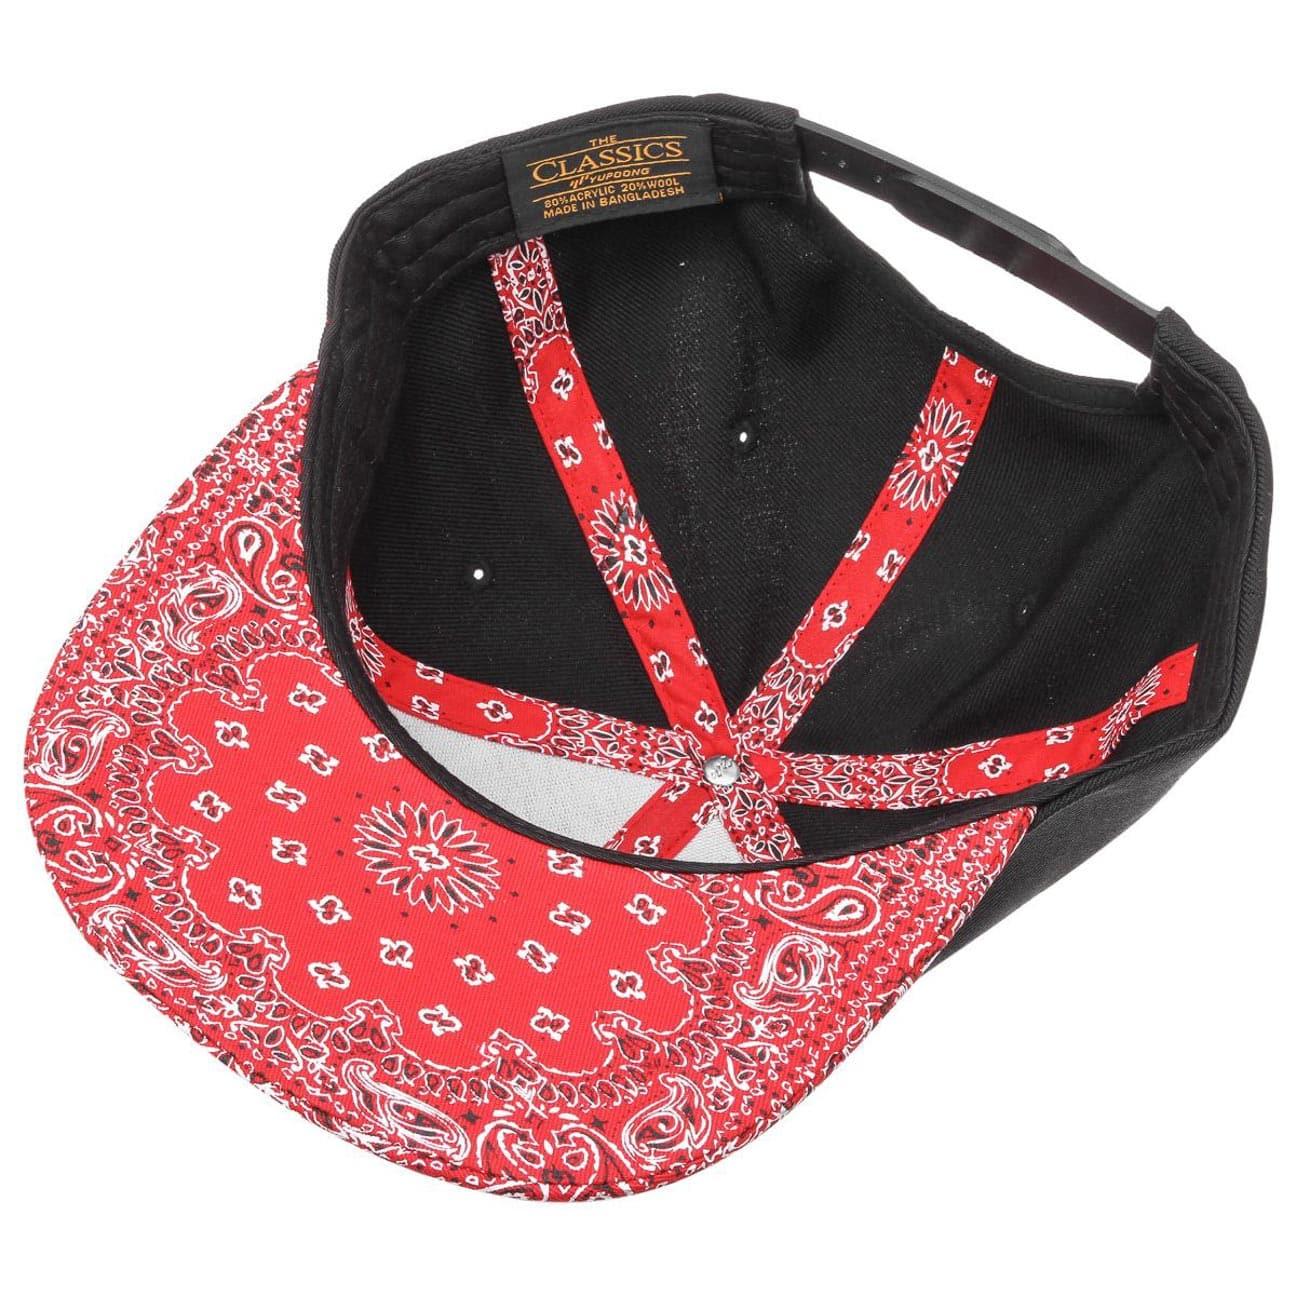 Bandana Snapback Cap Eur 8 95 Gt Hats Caps Amp Beanies